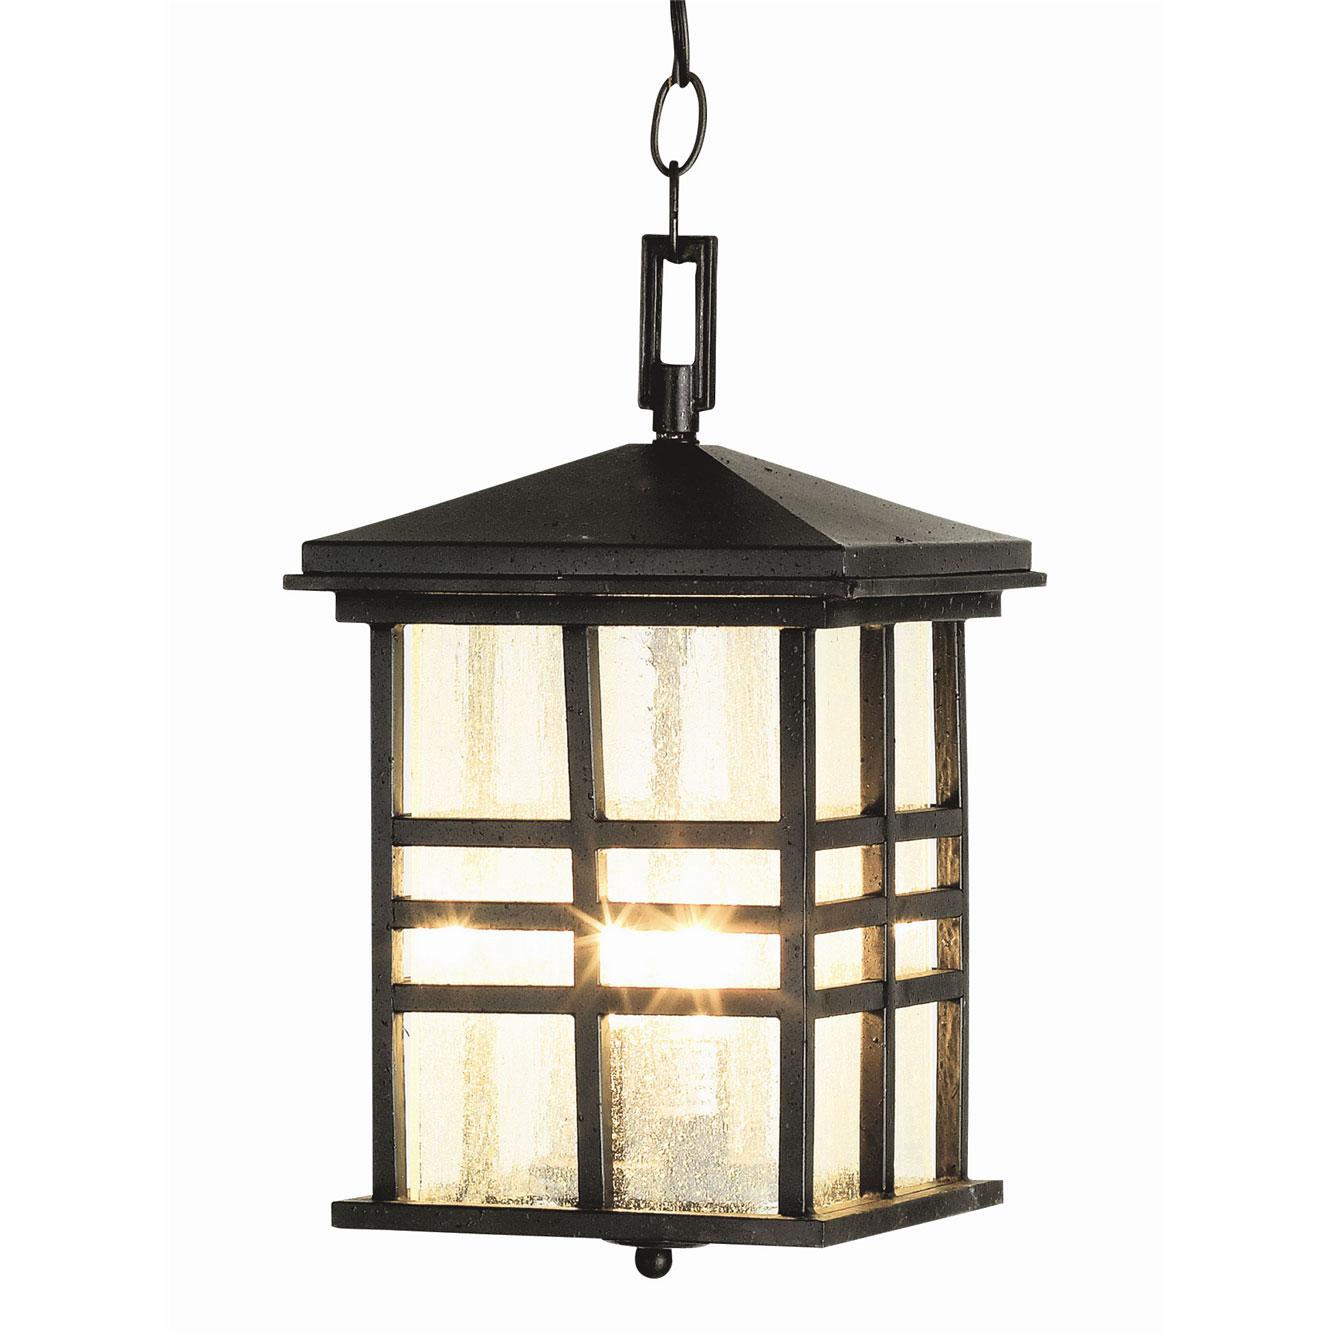 Outdoor Pendant Porch Light Uk: Rustic Craftsman Outdoor Hanging Lantern By Trans Globe